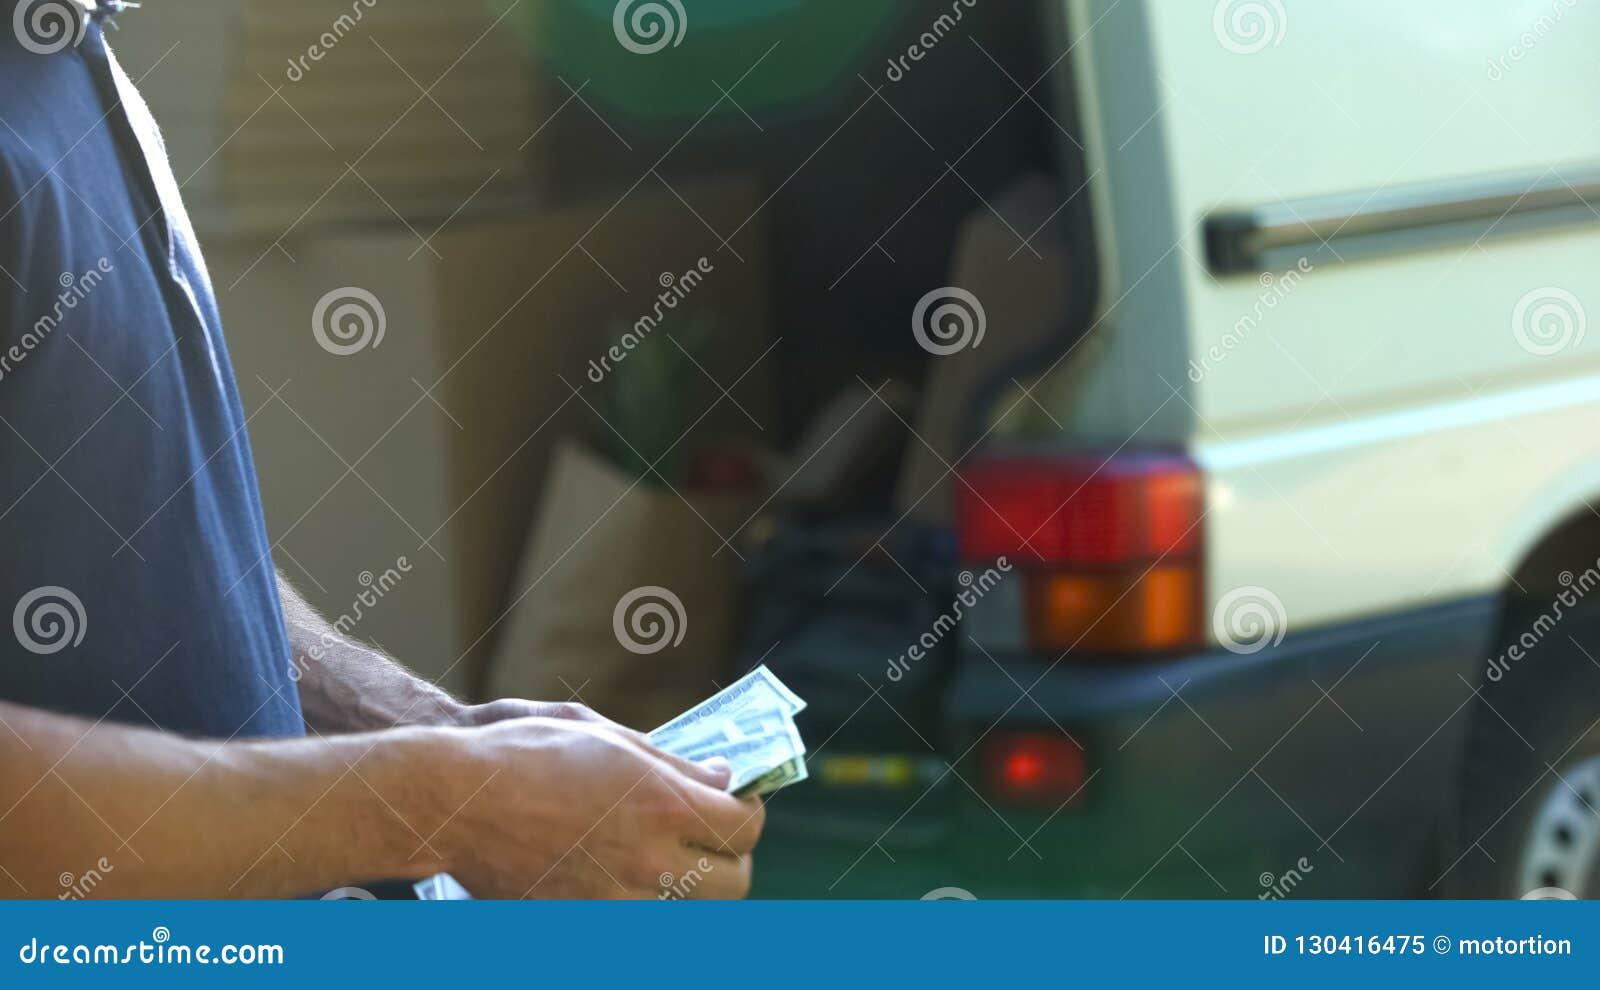 Man counting banknotes and closing van door, small business, moving company